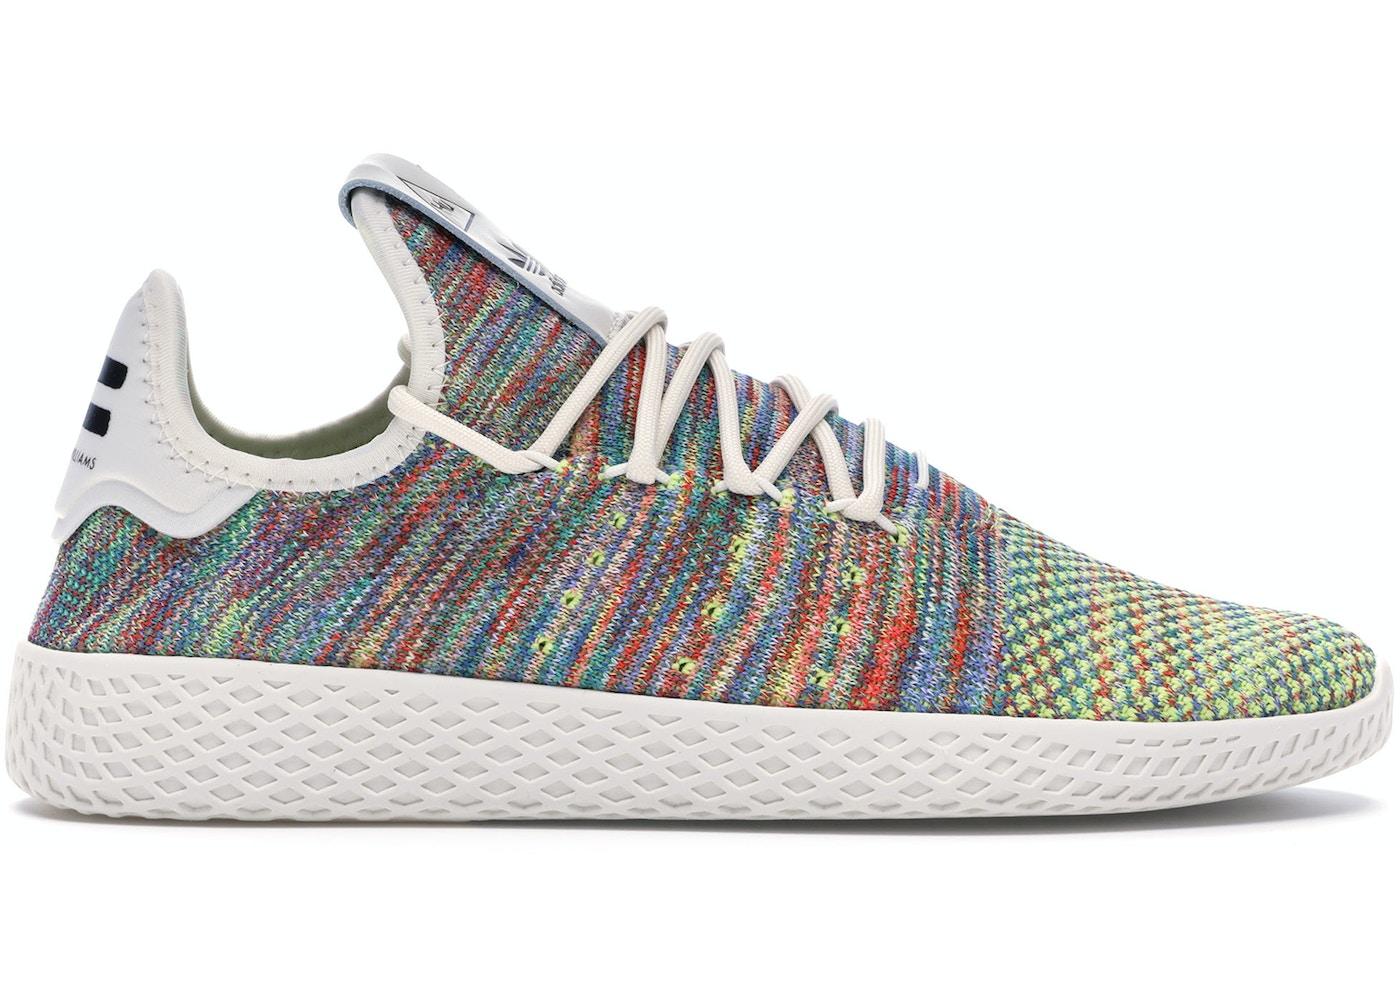 low priced 252cd 4ab64 adidas Tennis HU Pharrell Holi Multi-Color - CQ2631